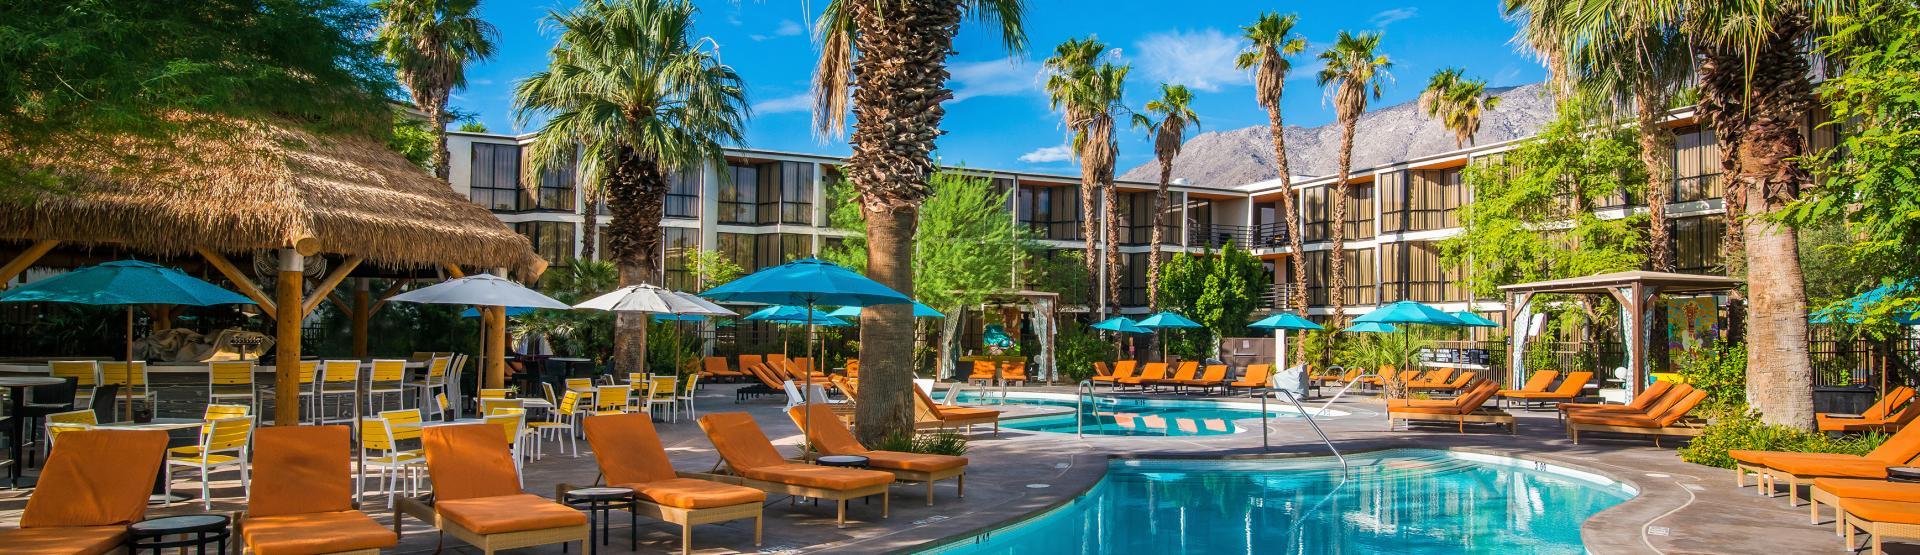 Riviera Palm Springs pool lounge